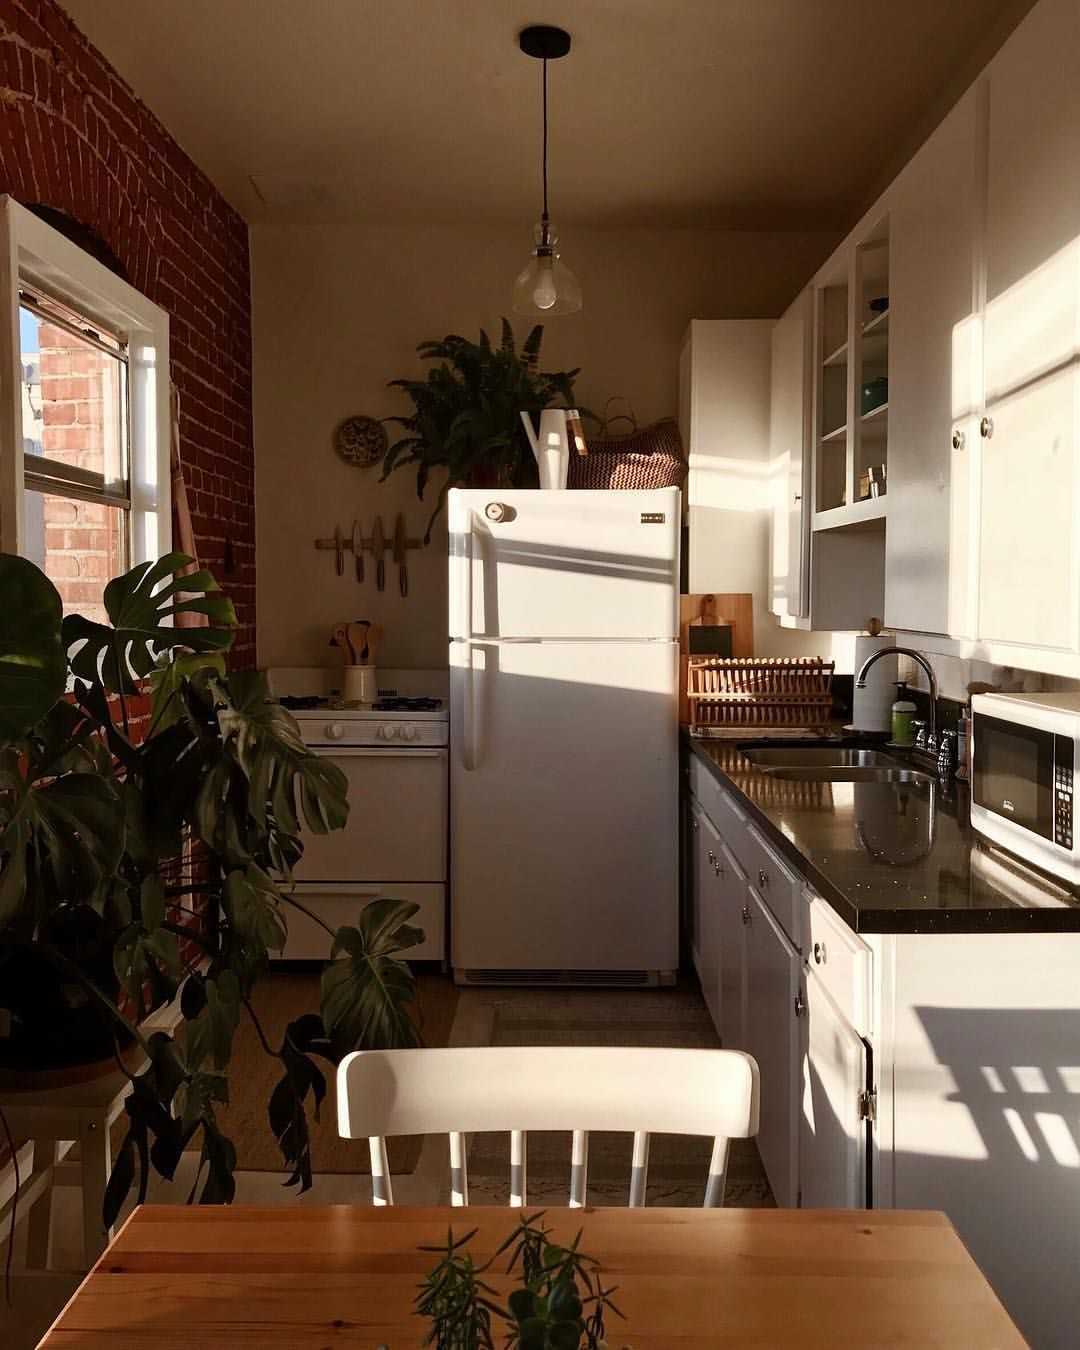 Emplacement Cuisine Dans La Maison besides bedroom, the other spot inside your house that needs